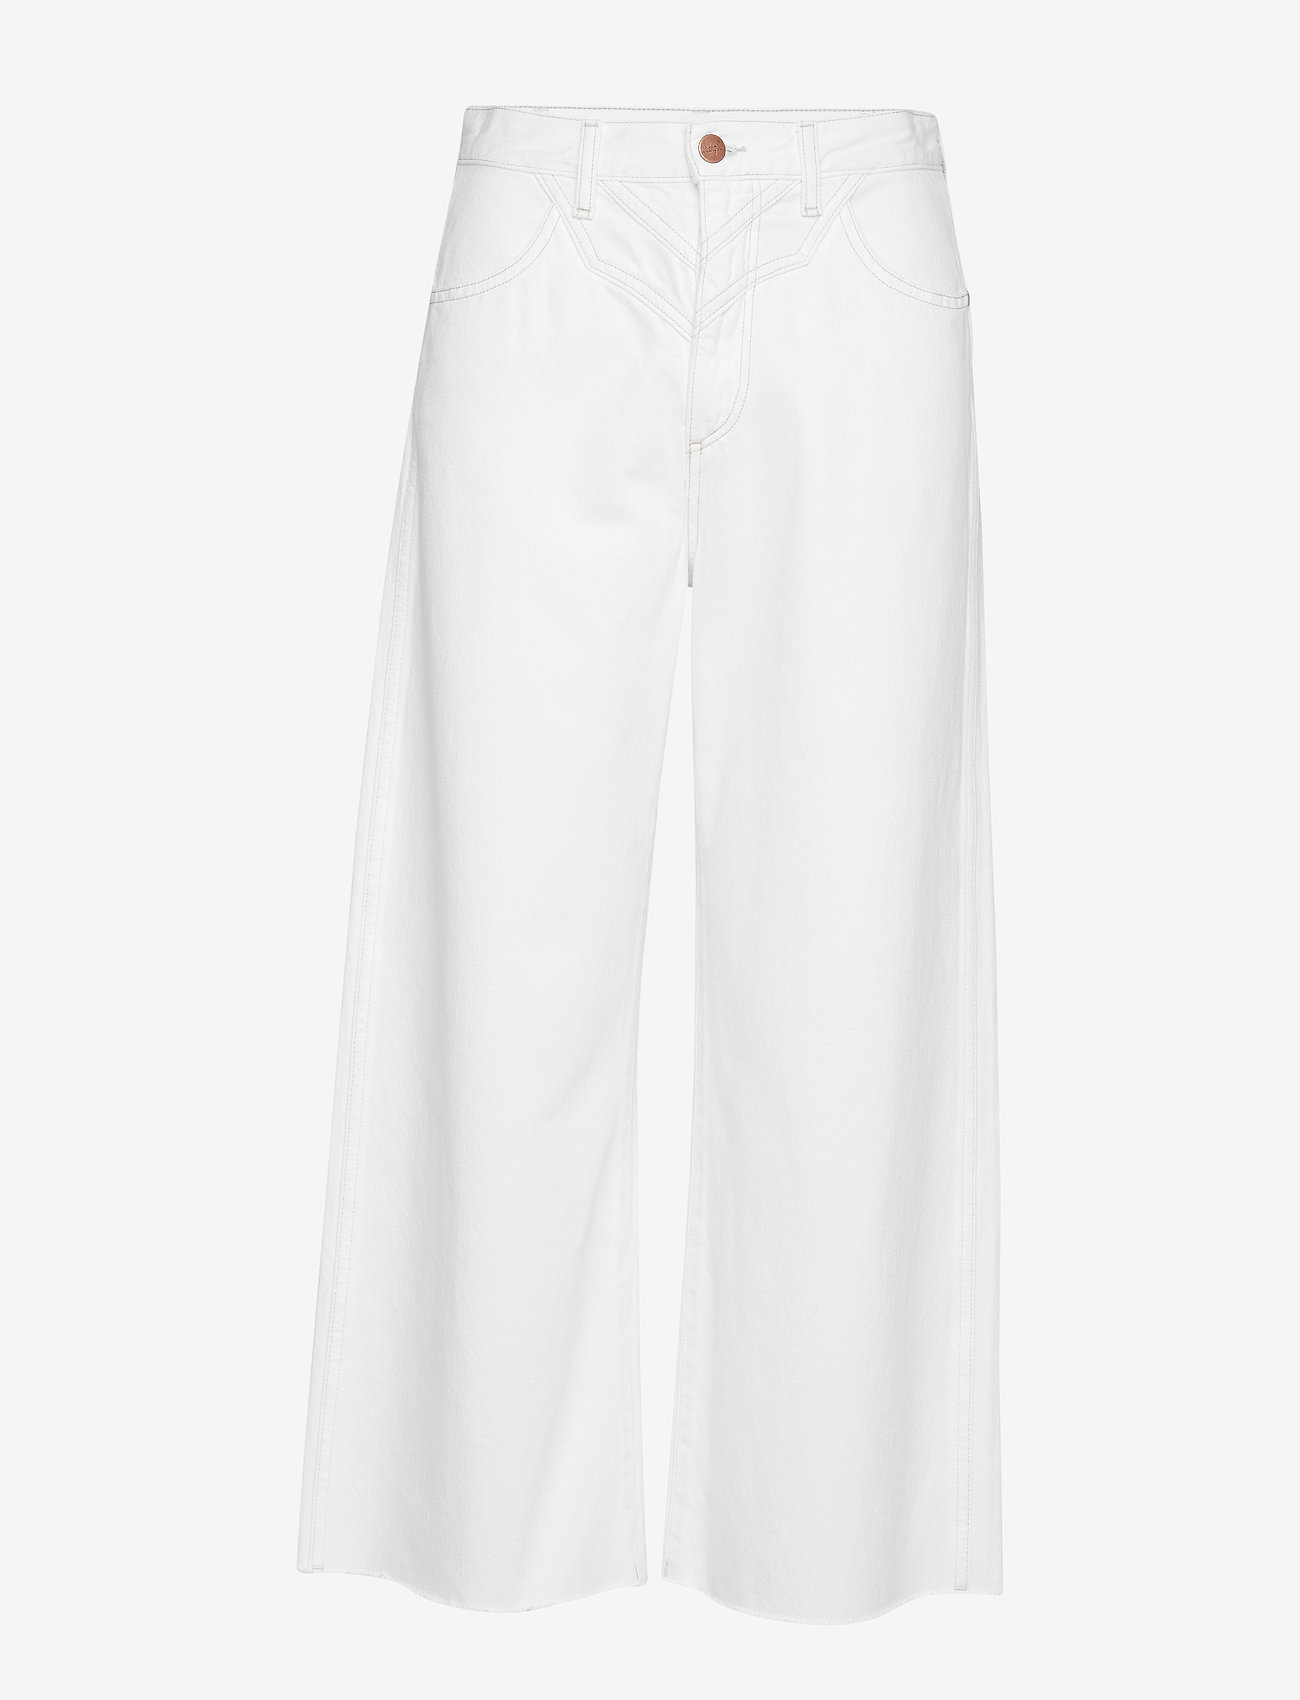 Wrangler - WESTERN CULOTTE - pantalons larges - vintage white